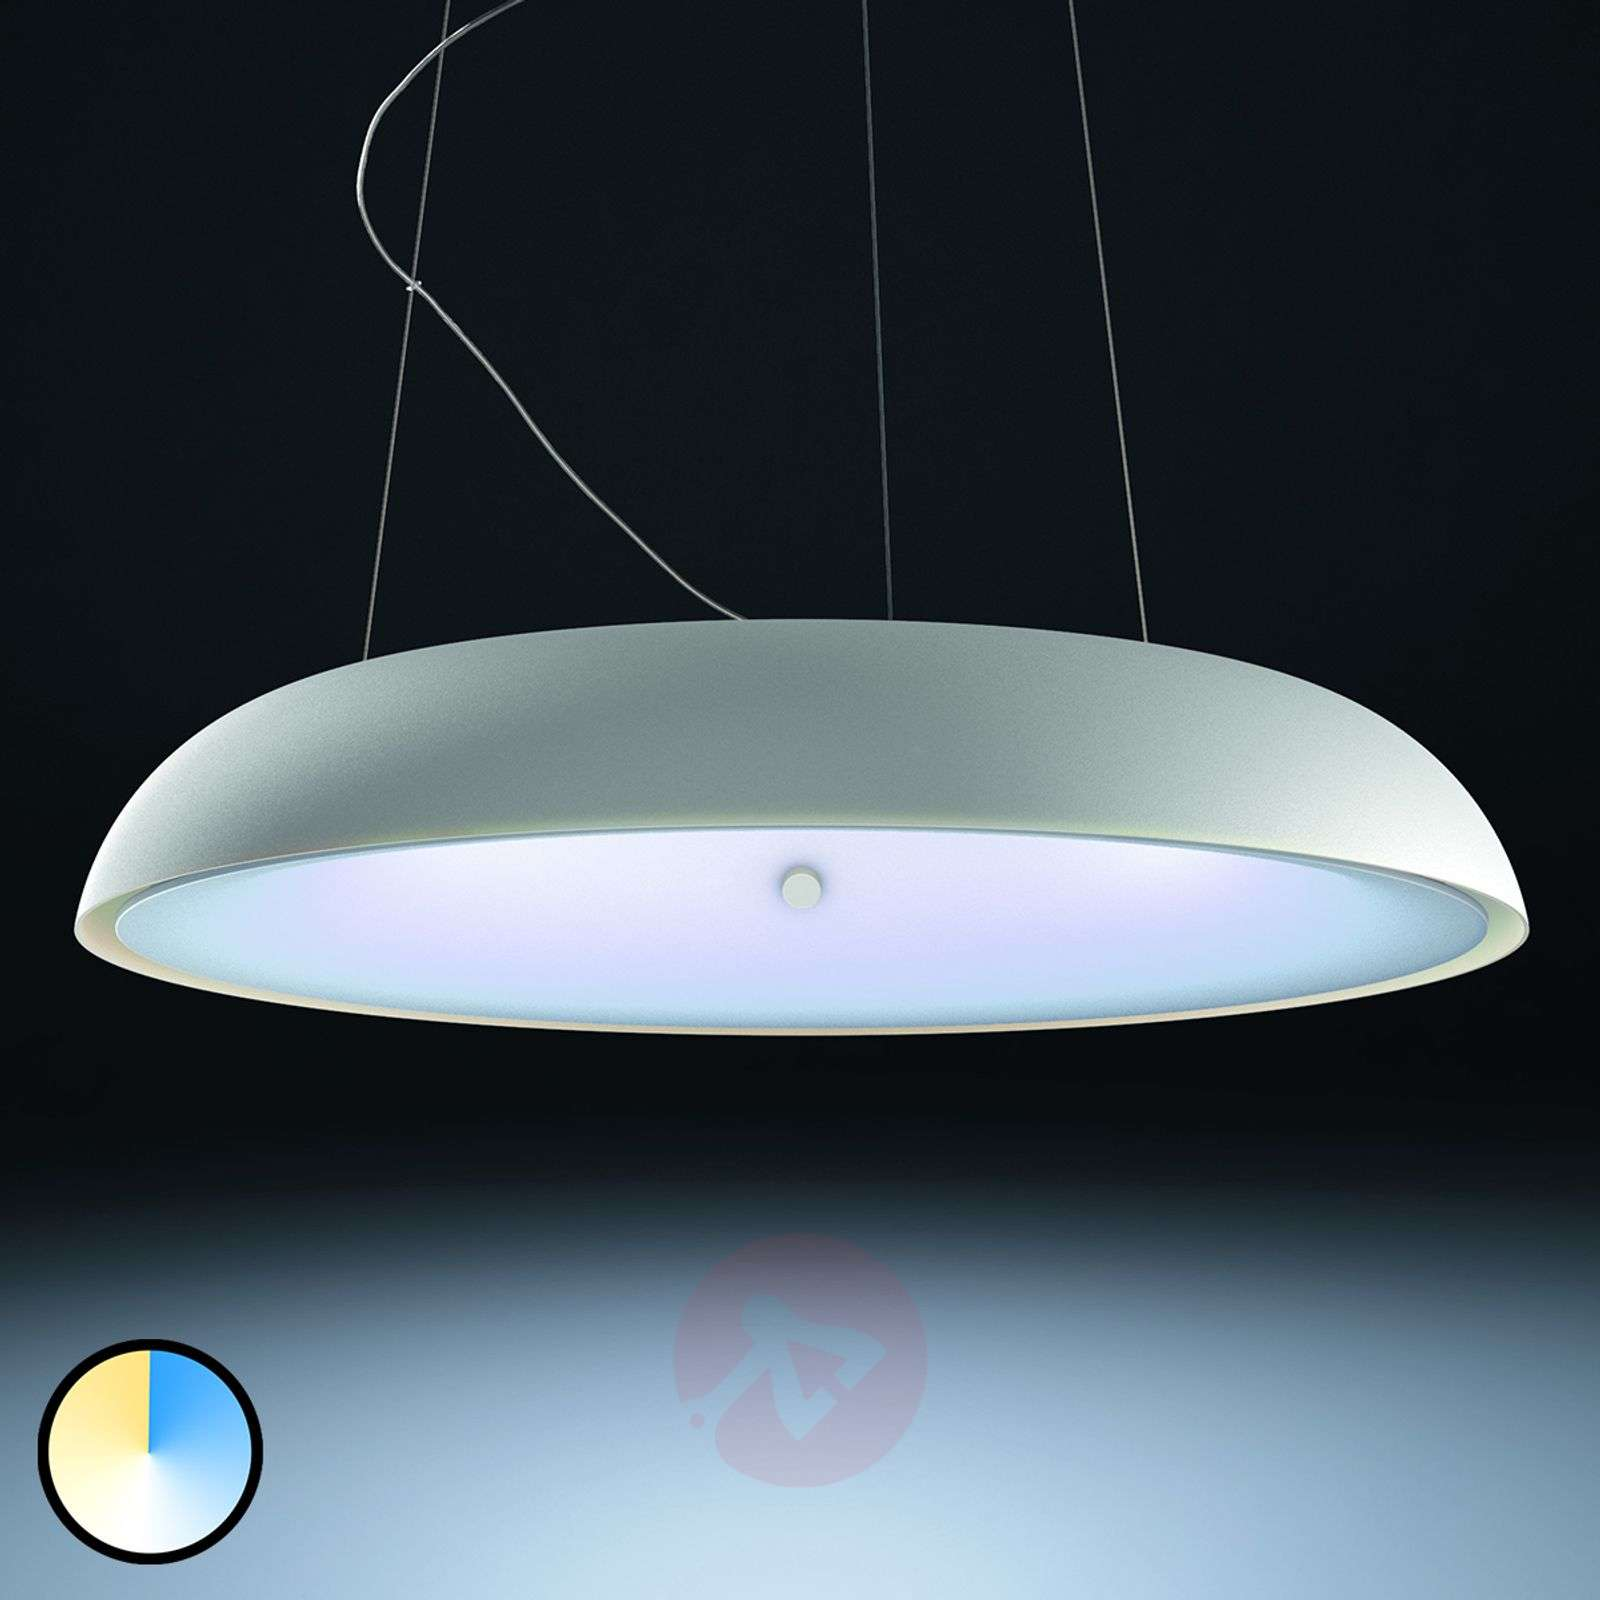 Philips Hue Led Hanging Light Amaze In White Lights Ie